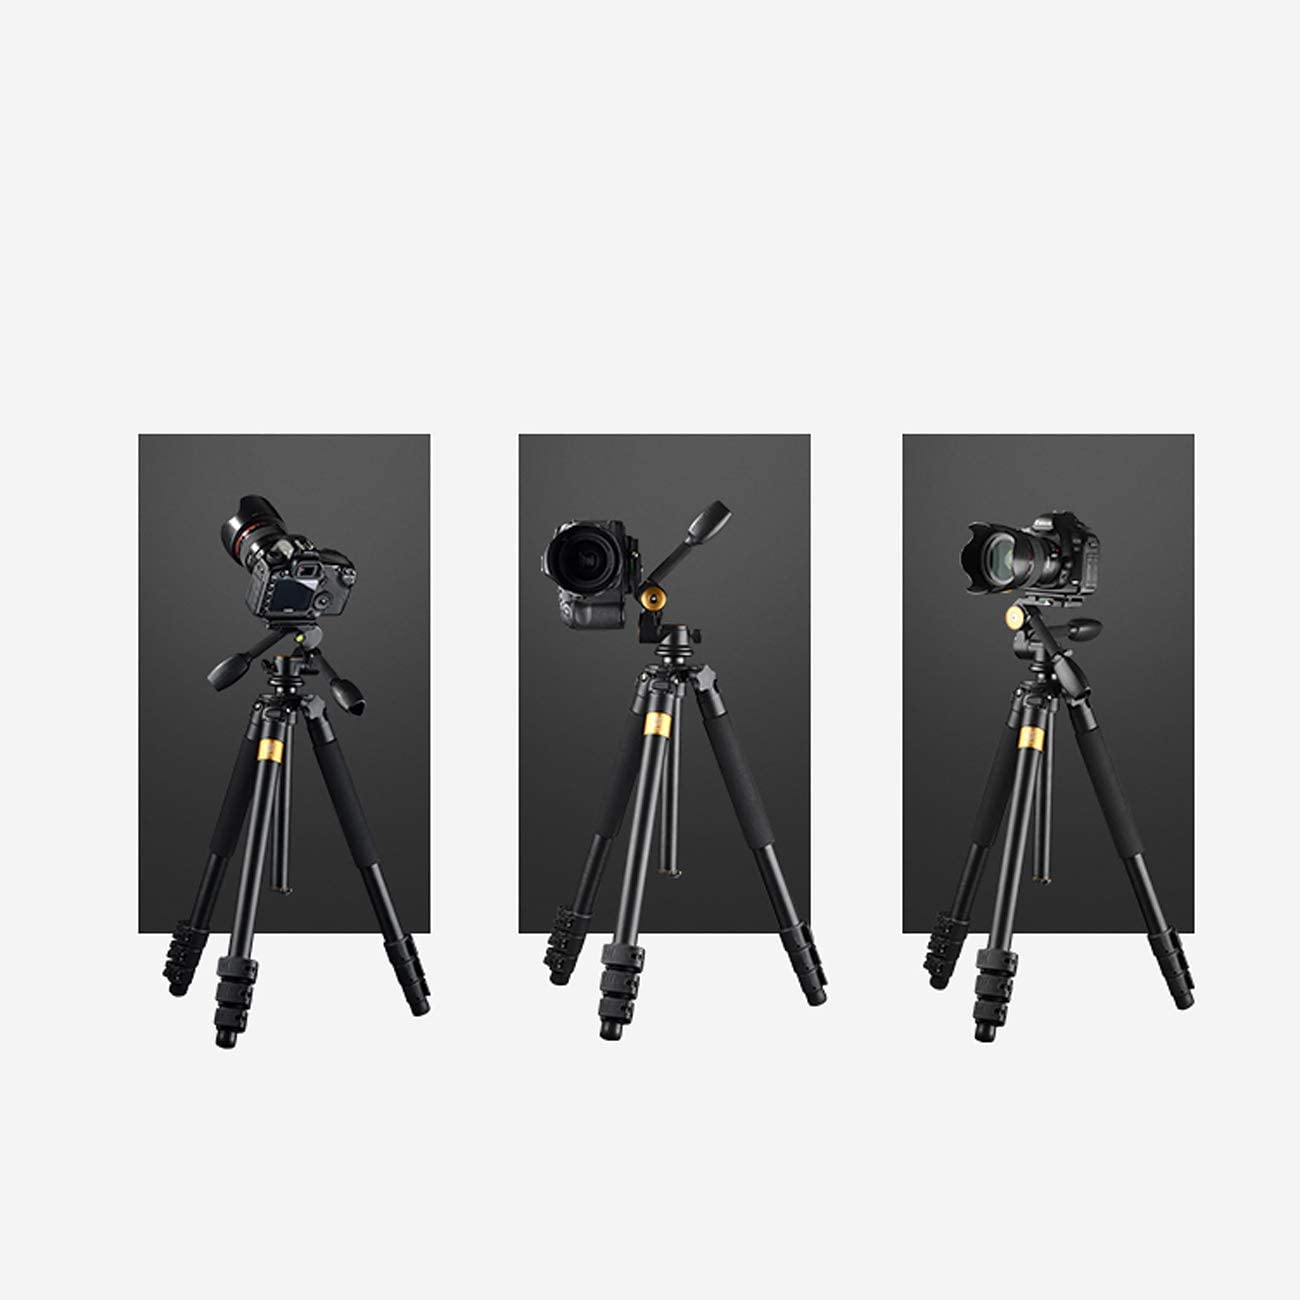 Double Handle Design with Storage Bag Black Professional Photography Aluminum Alloy Heavy Duty Tripod Up to 180cm Maximum Load 20KG CJGXJZJ Camera Tripod